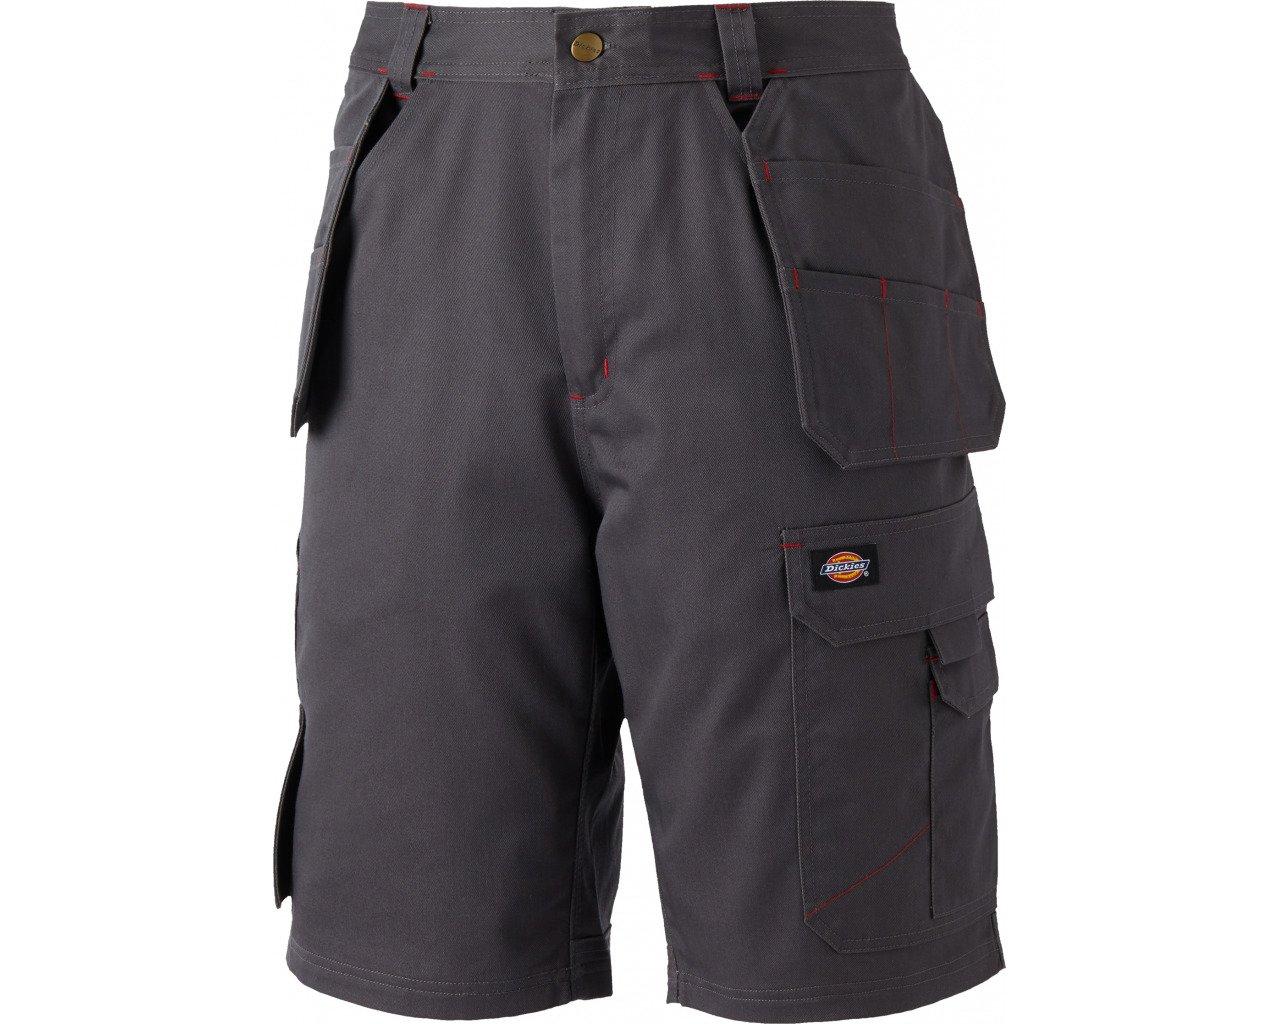 Size 28 Dickies WD802-GR-28 Red hawk Pro Work Short Grey